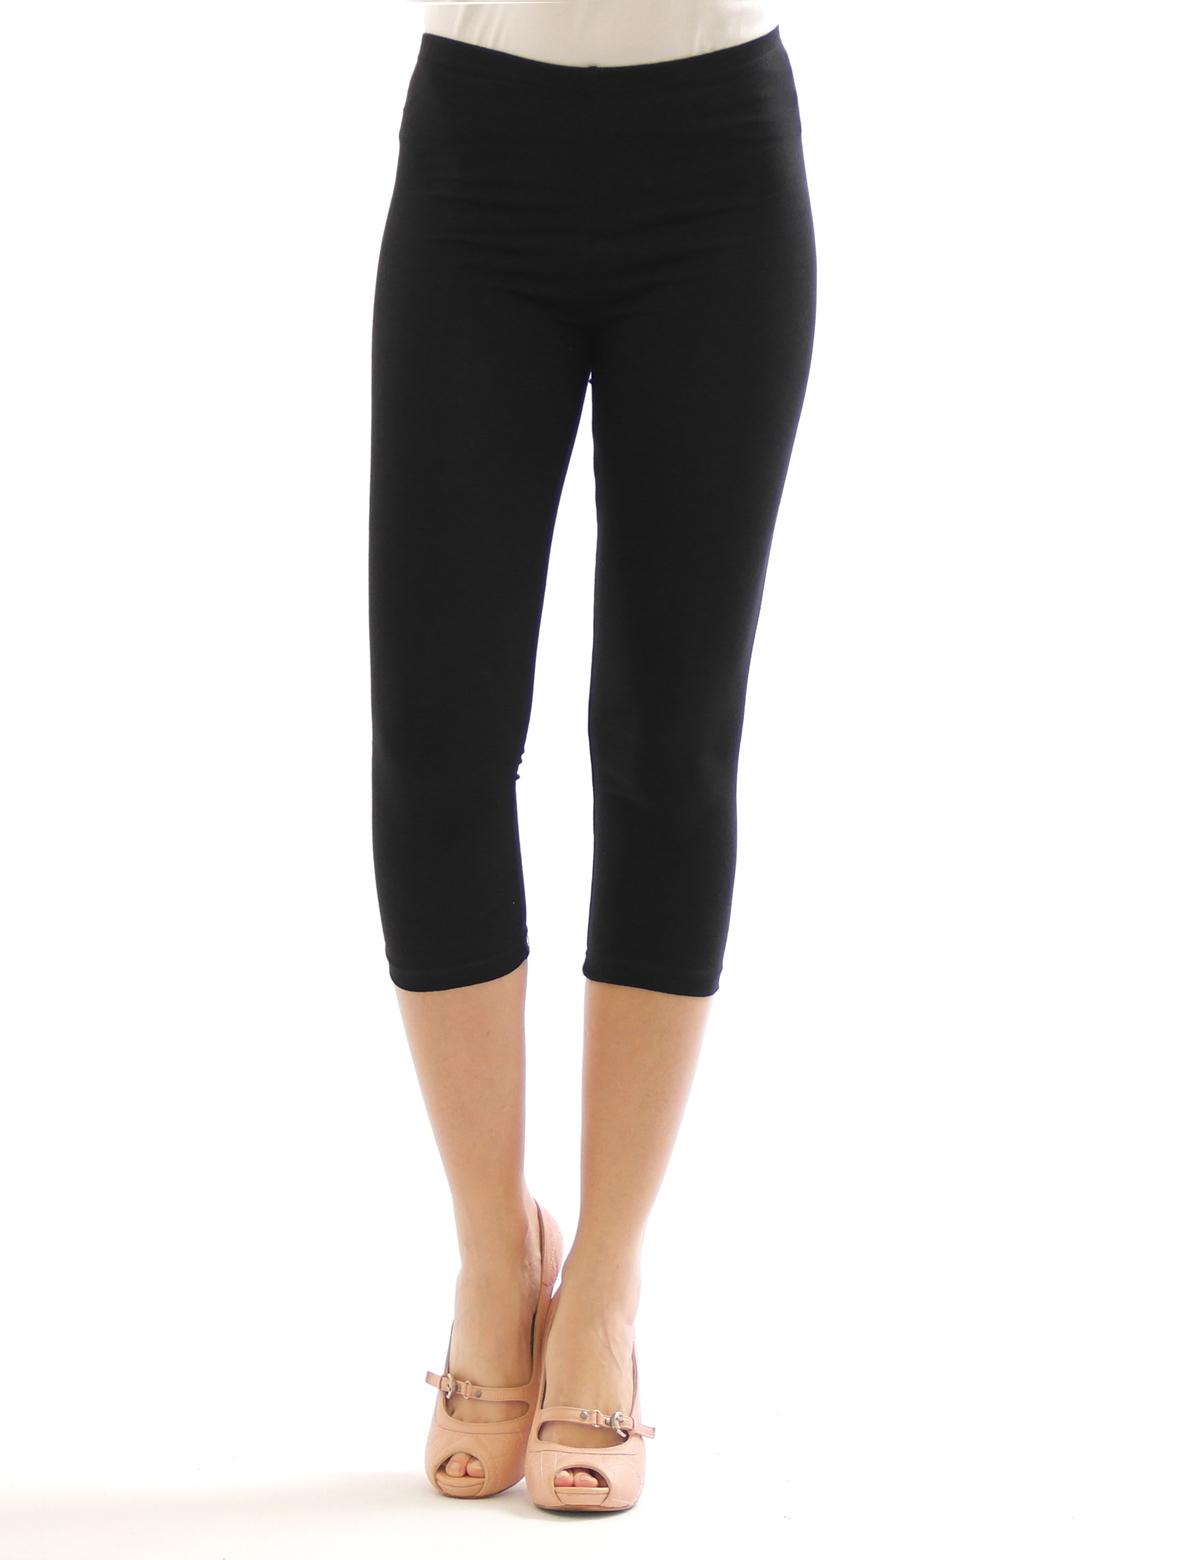 damen 3 4 capri leggings leggins kurze knie hose baumwolle ebay. Black Bedroom Furniture Sets. Home Design Ideas